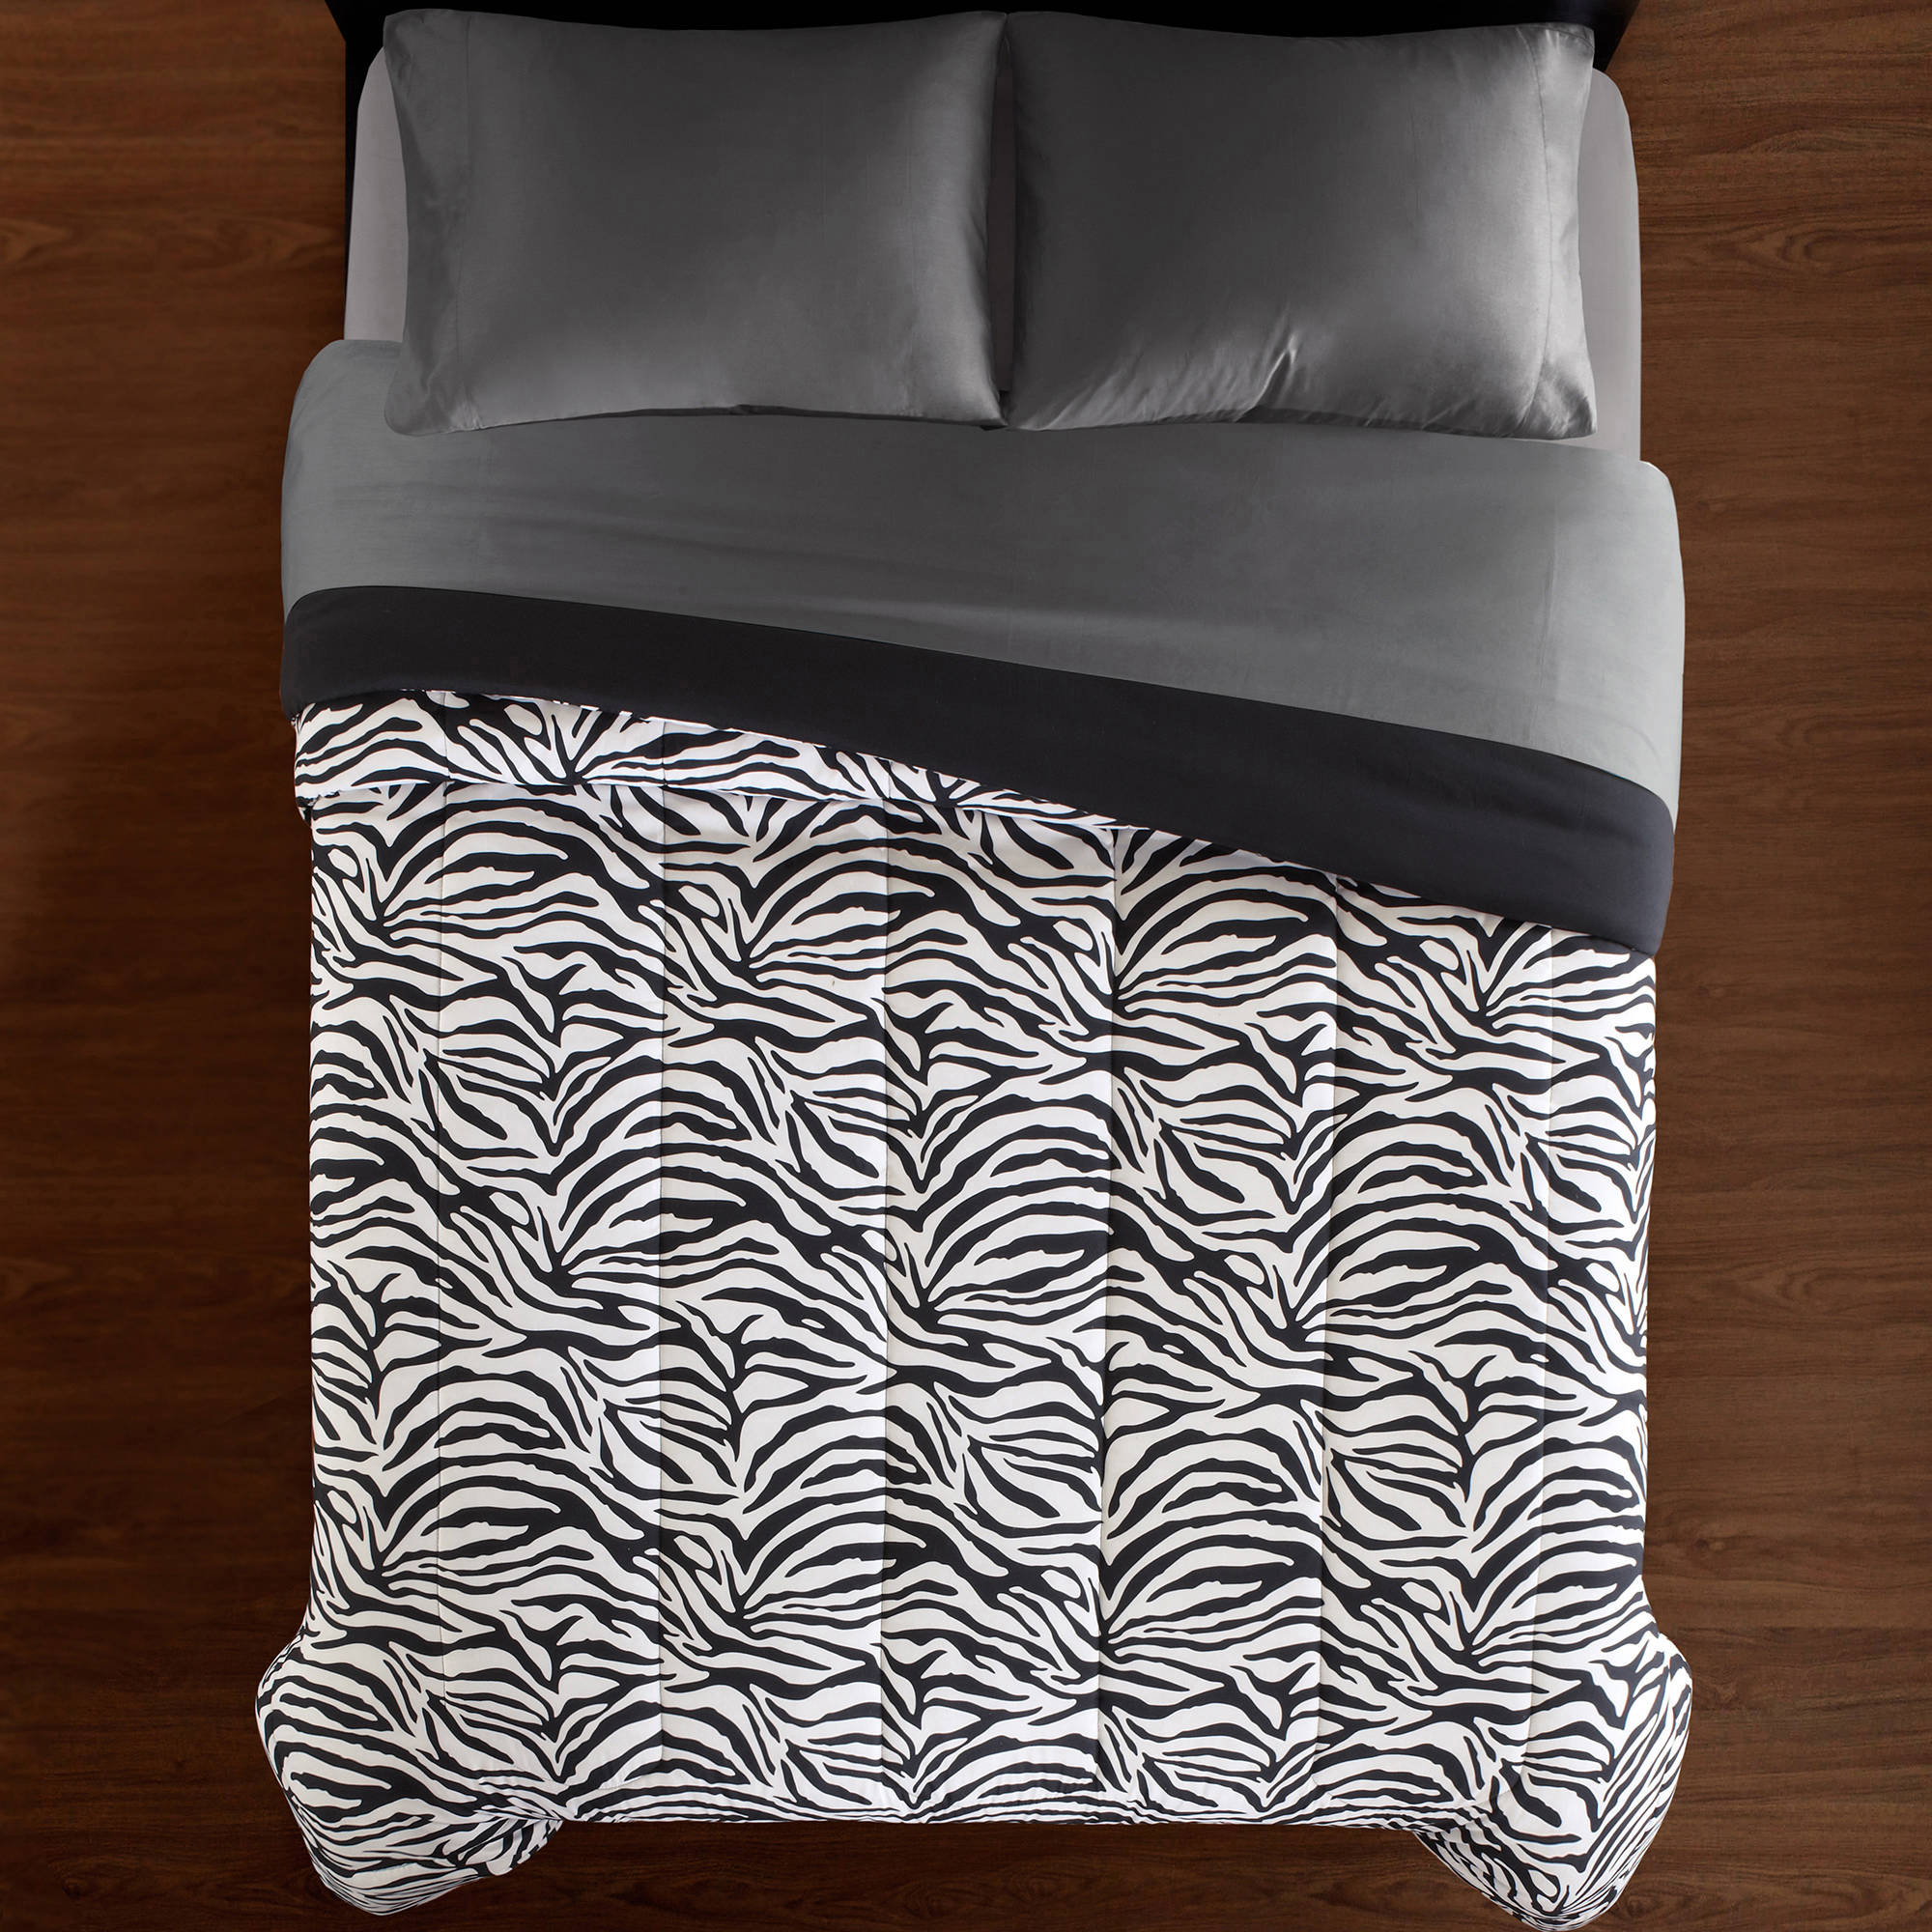 Mainstays Printed Bedding Comforter